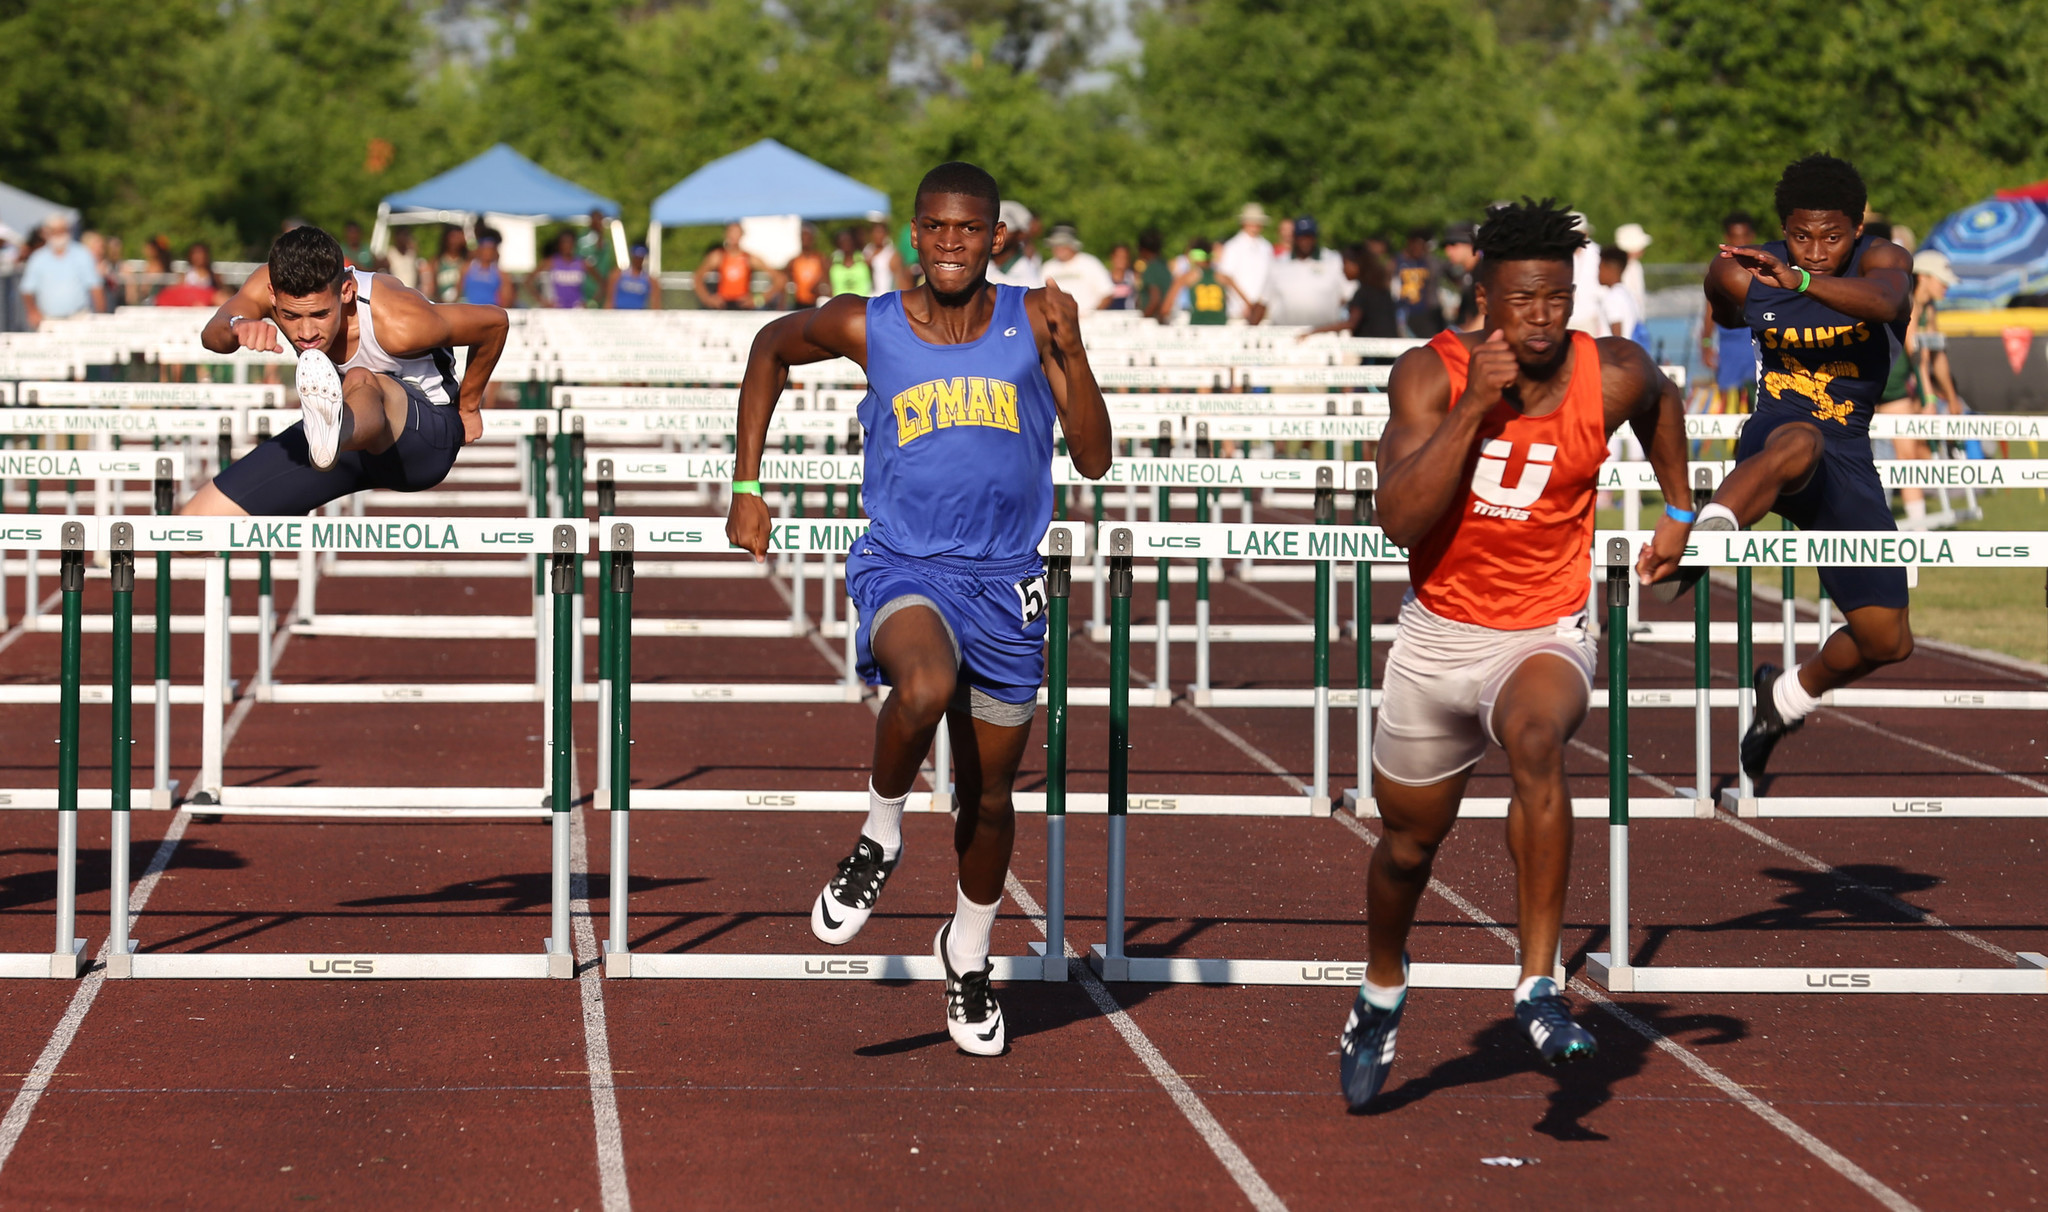 junior high school track meet order of events